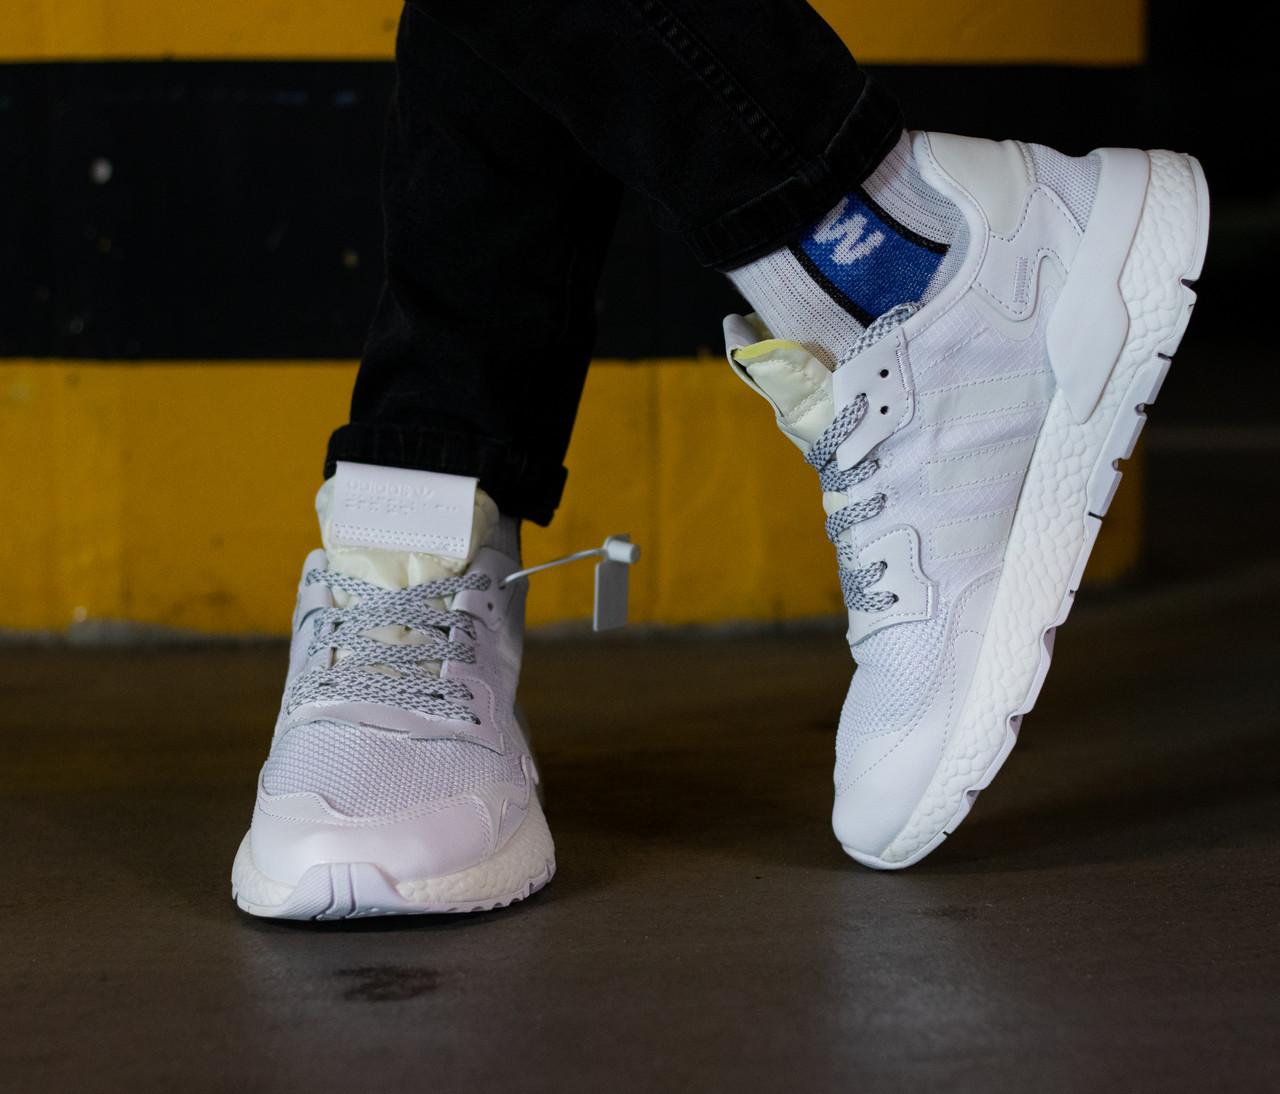 Кроссовки мужские Adidas Nite Jogger Triple White Адидас Найт Джоггер Белые